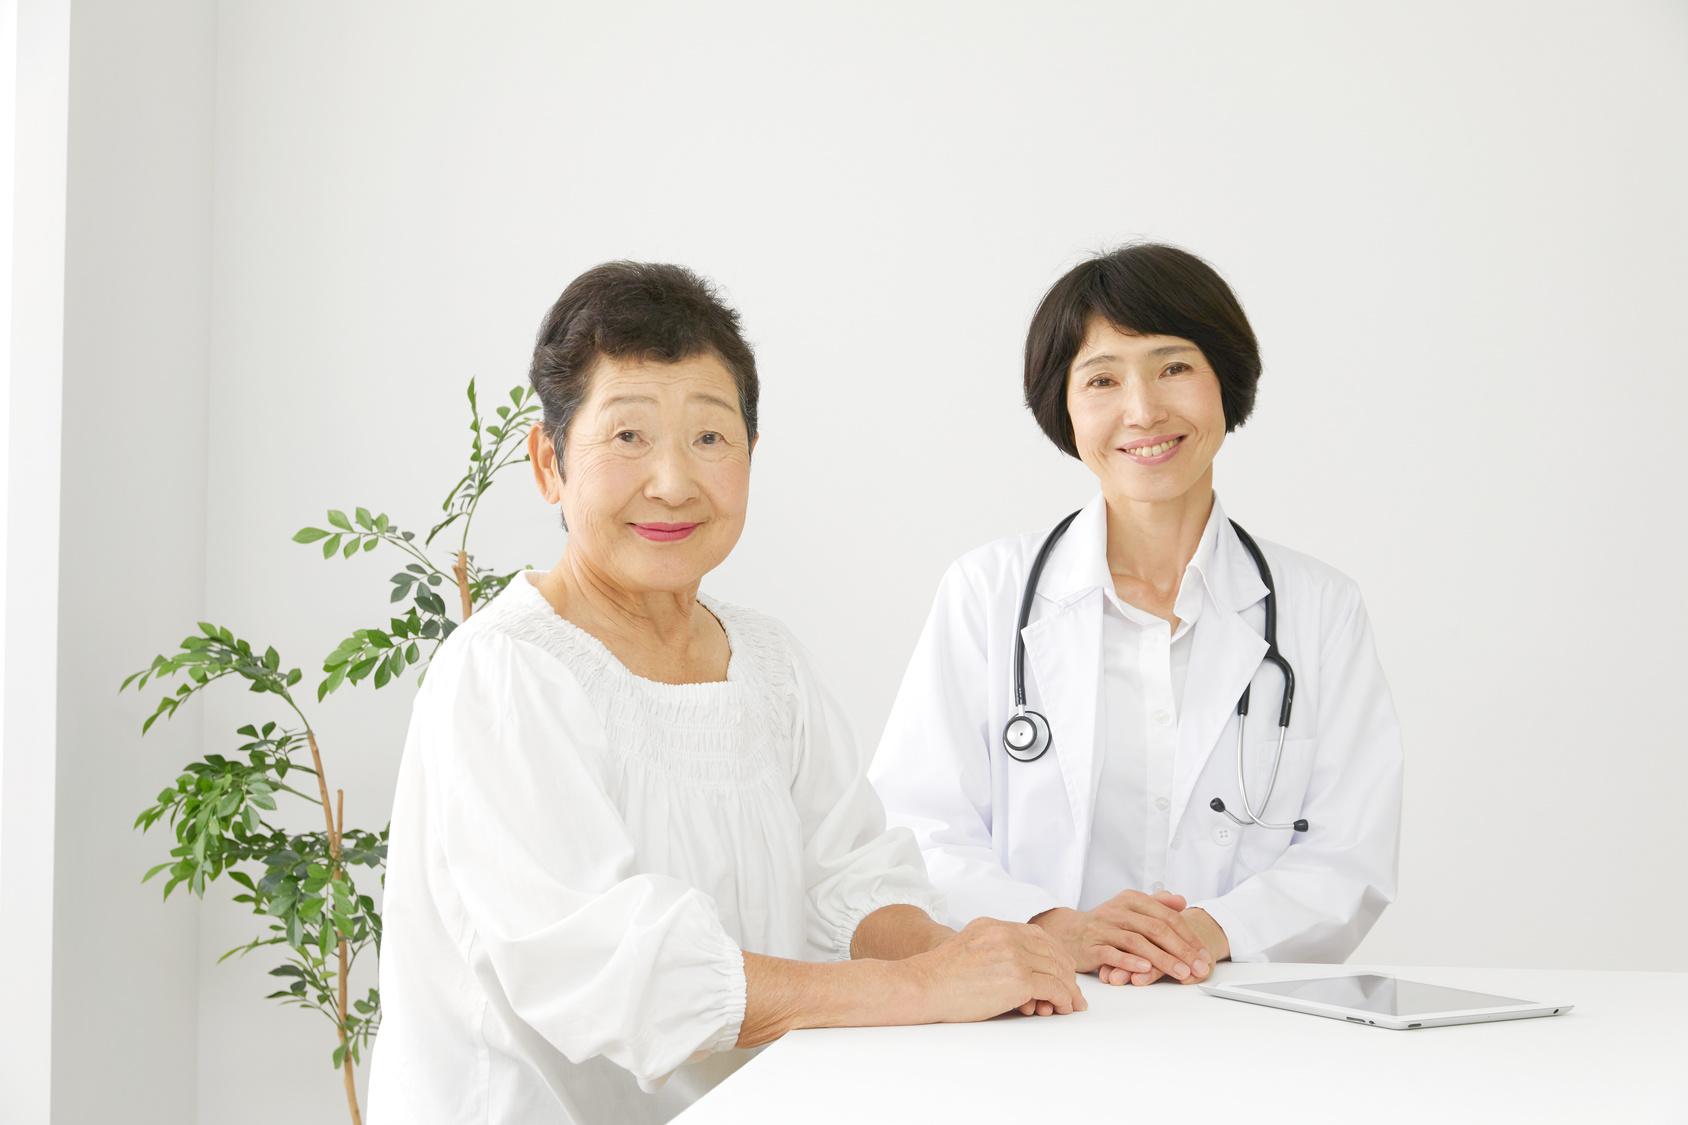 医療 医師と高齢者